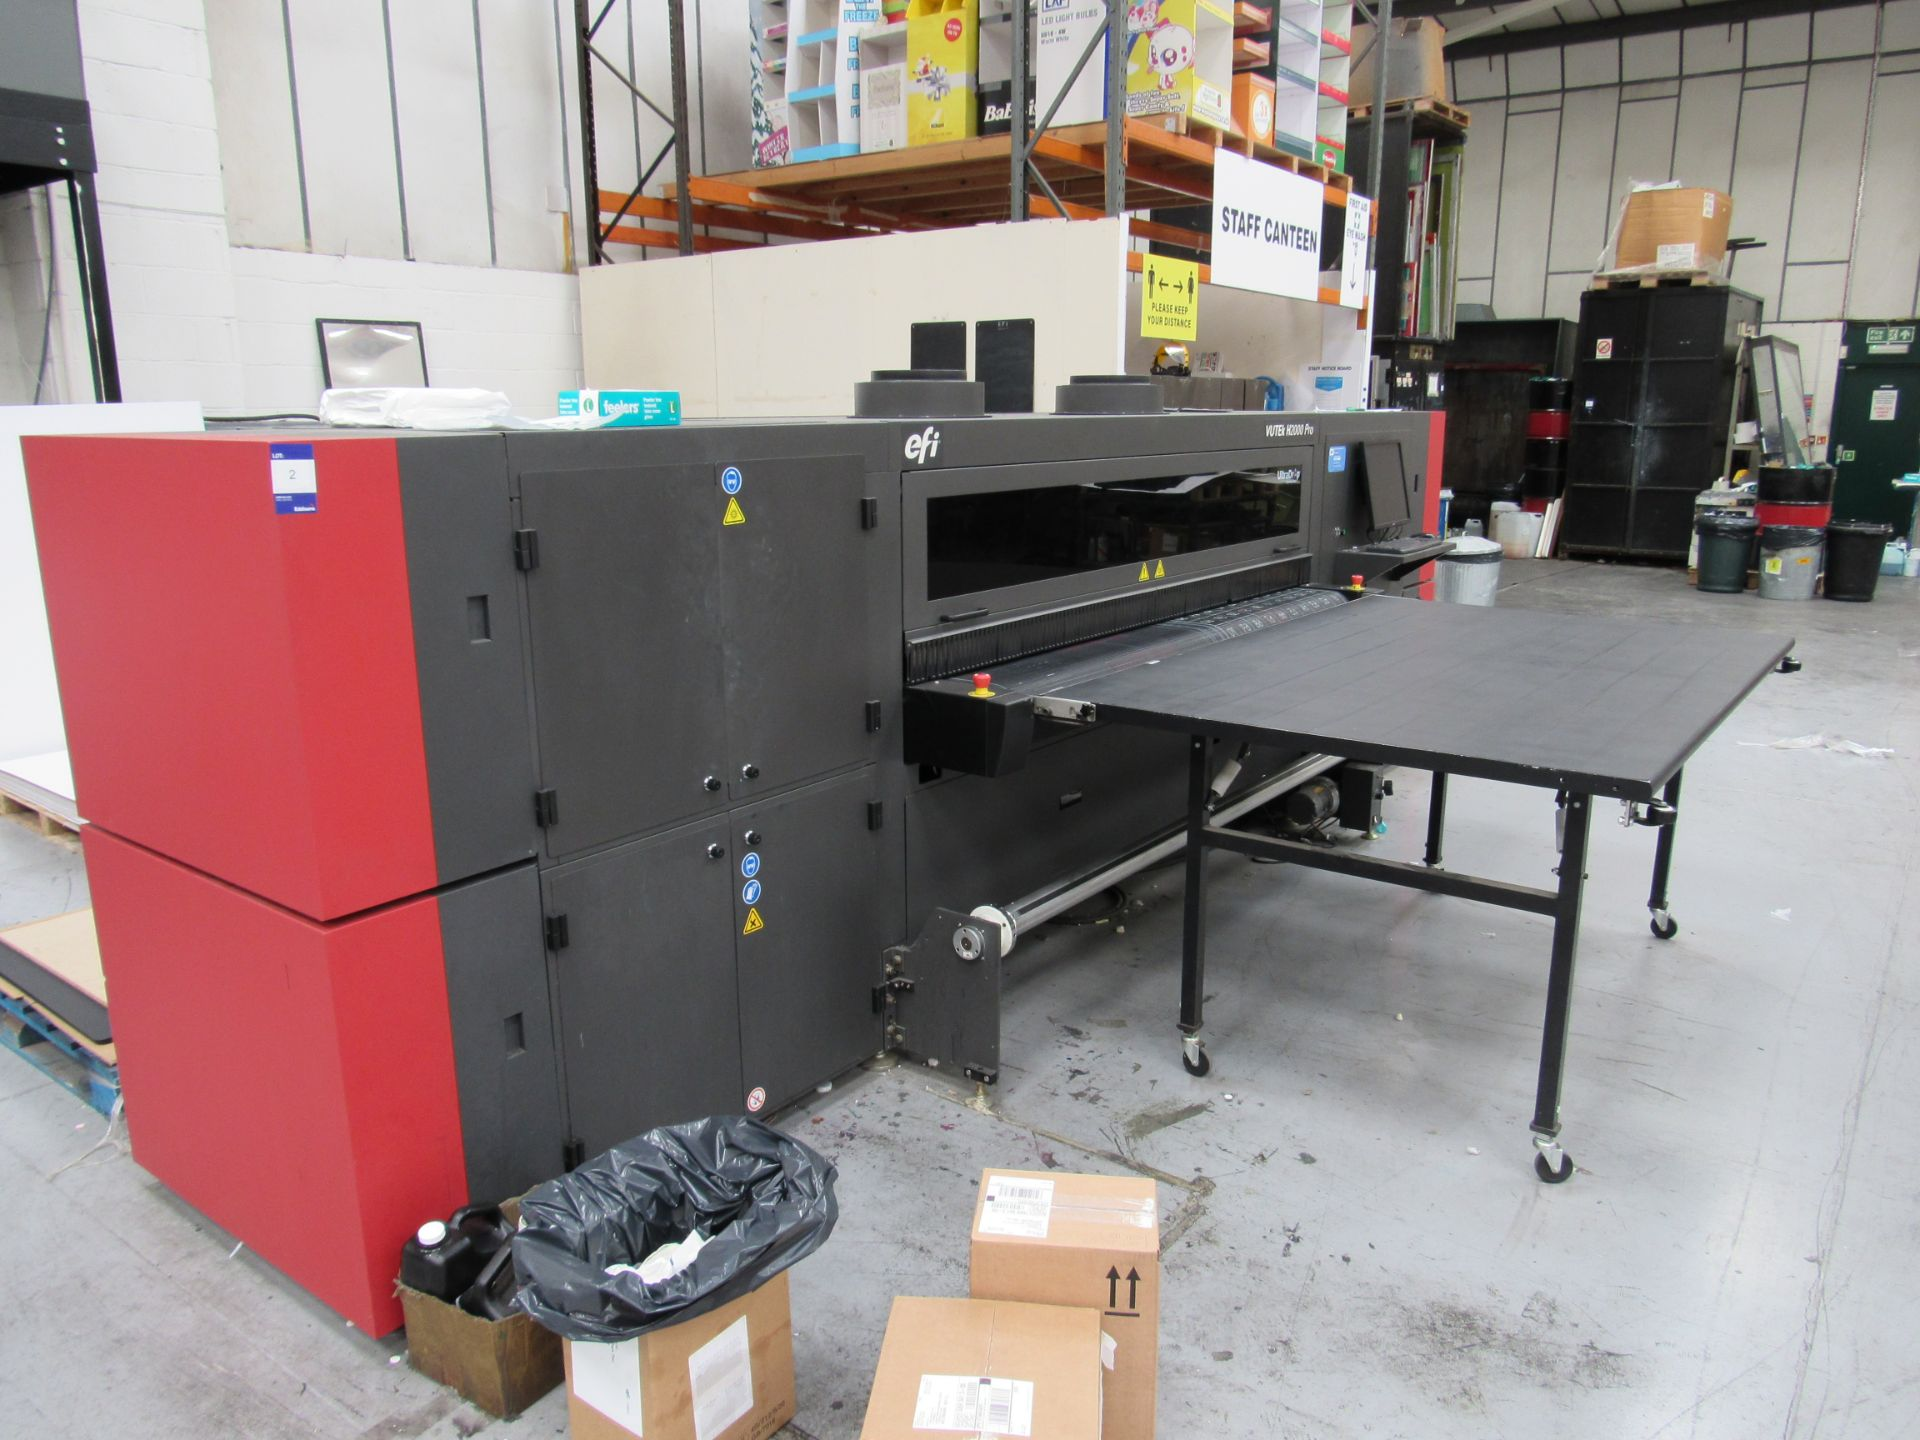 EFI VUTEk H2000 Pro - UltraDrop Technology UV 2m Hybrid Printer, Serial Number 262013, Dec 2014, - Image 12 of 16